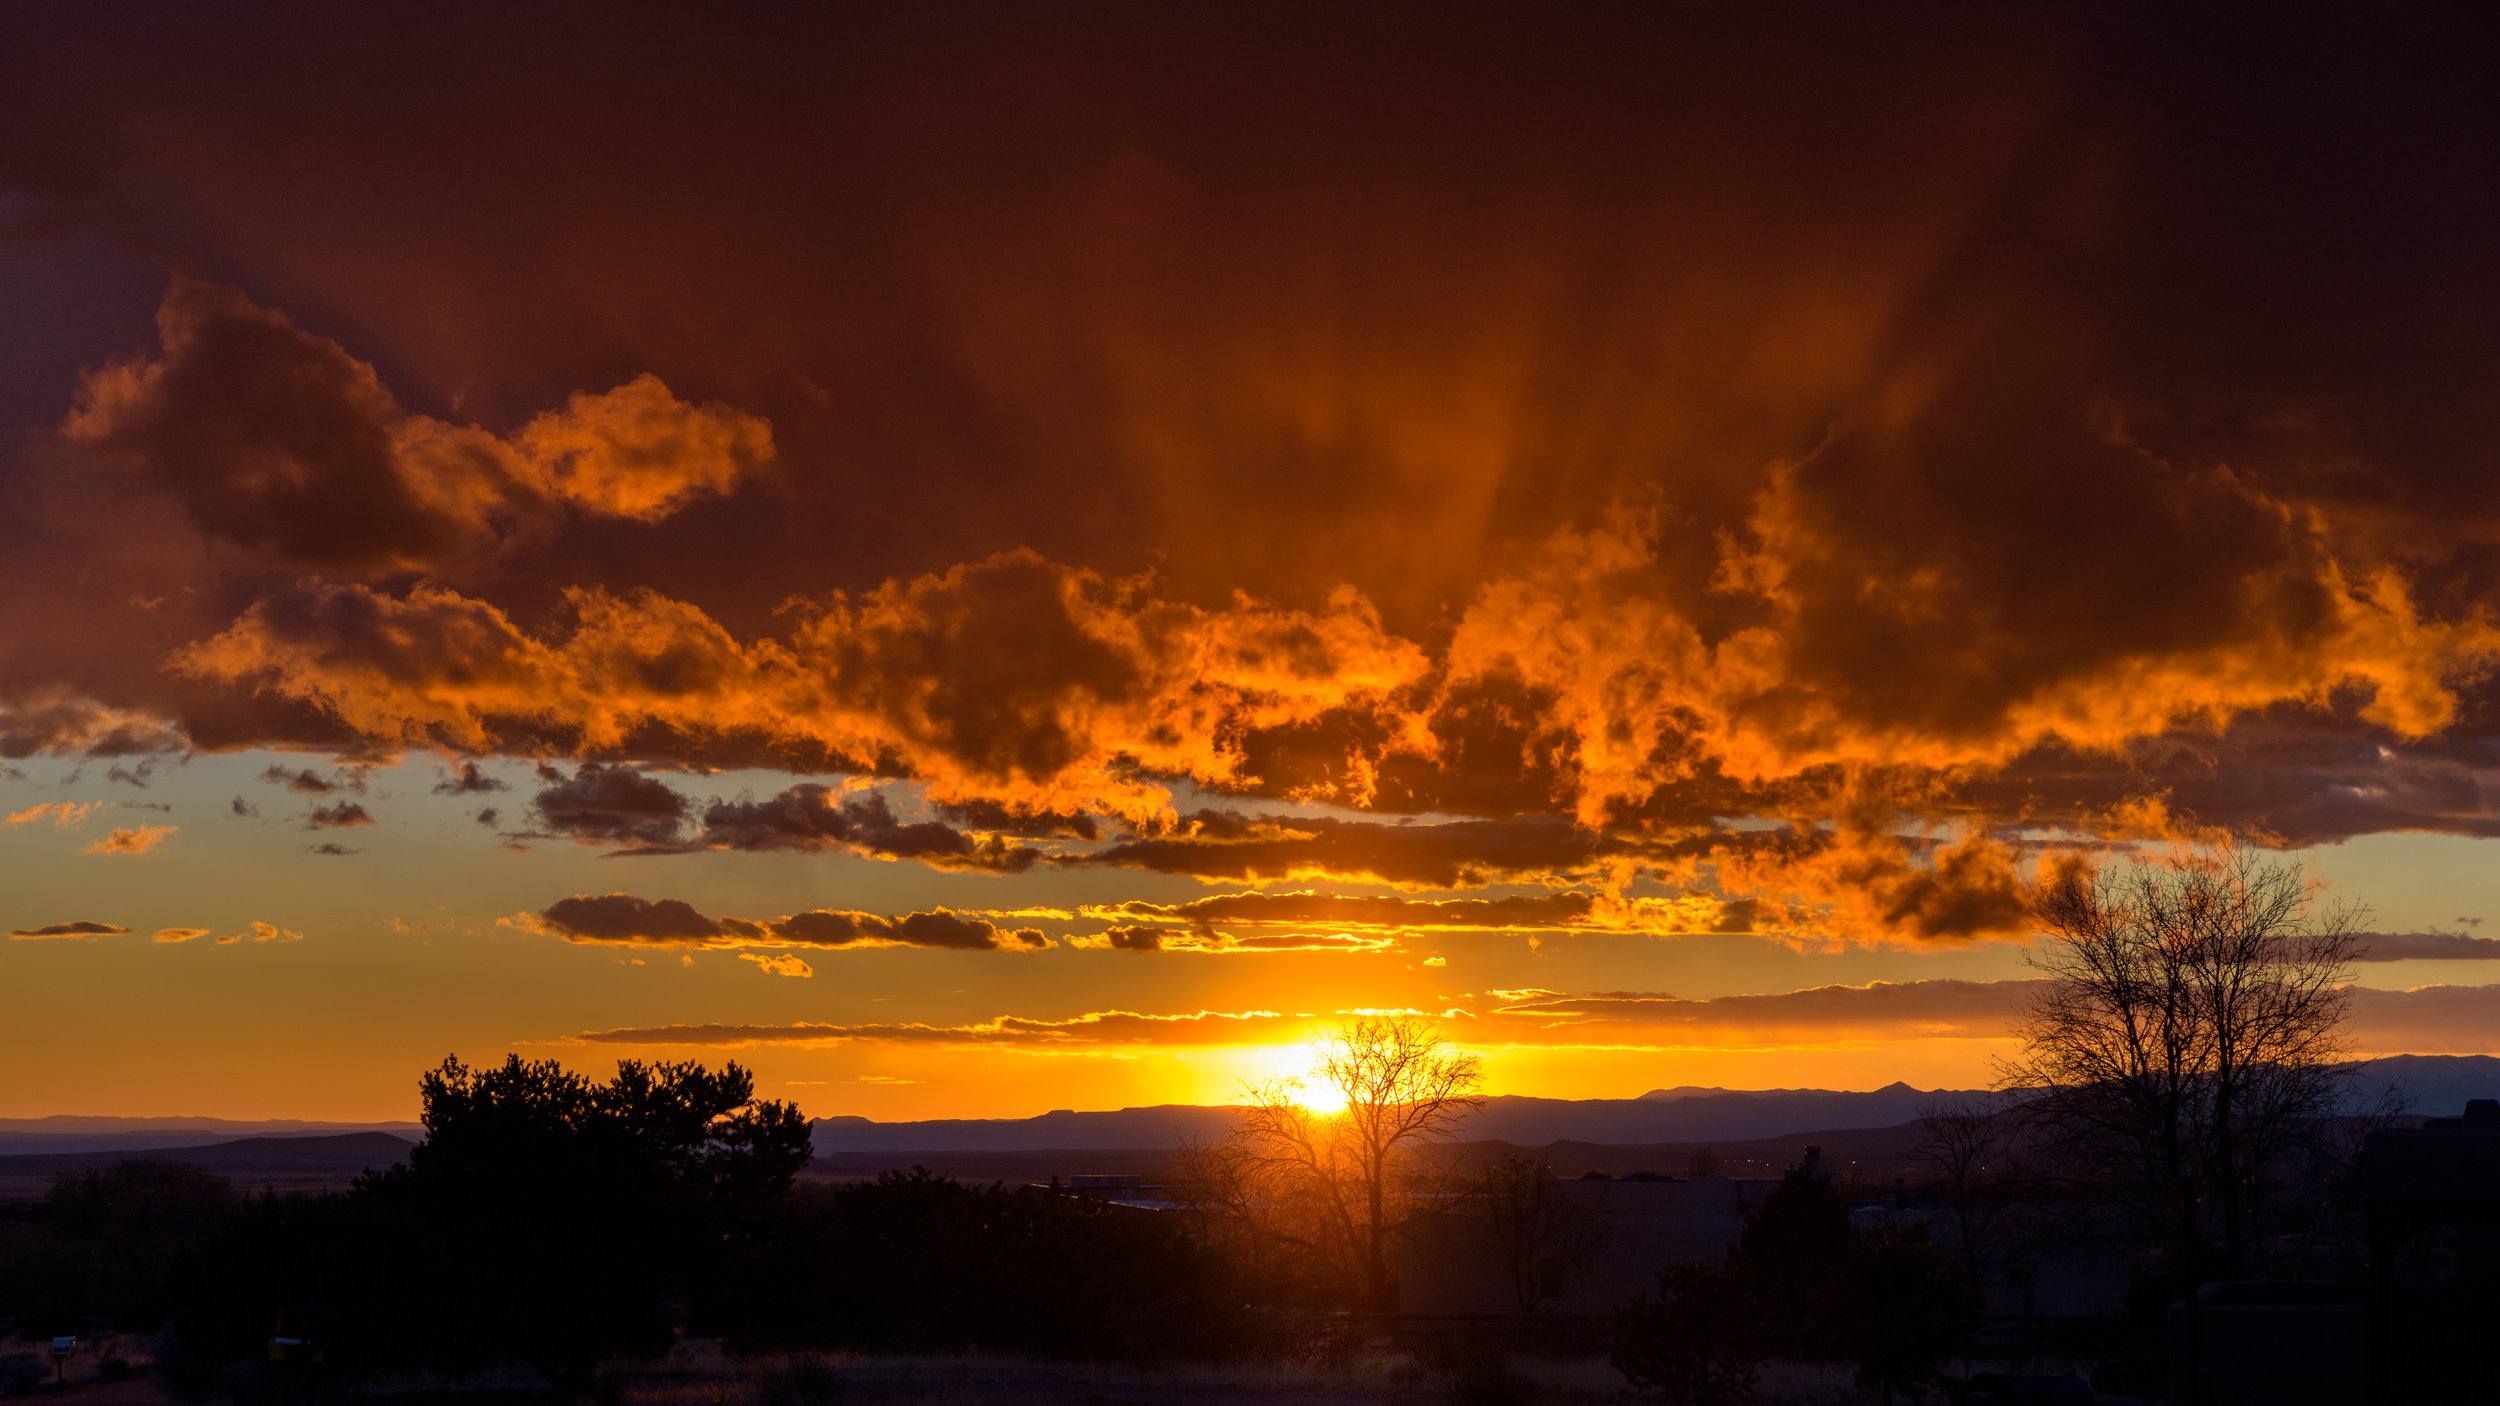 sunset-0461.jpg